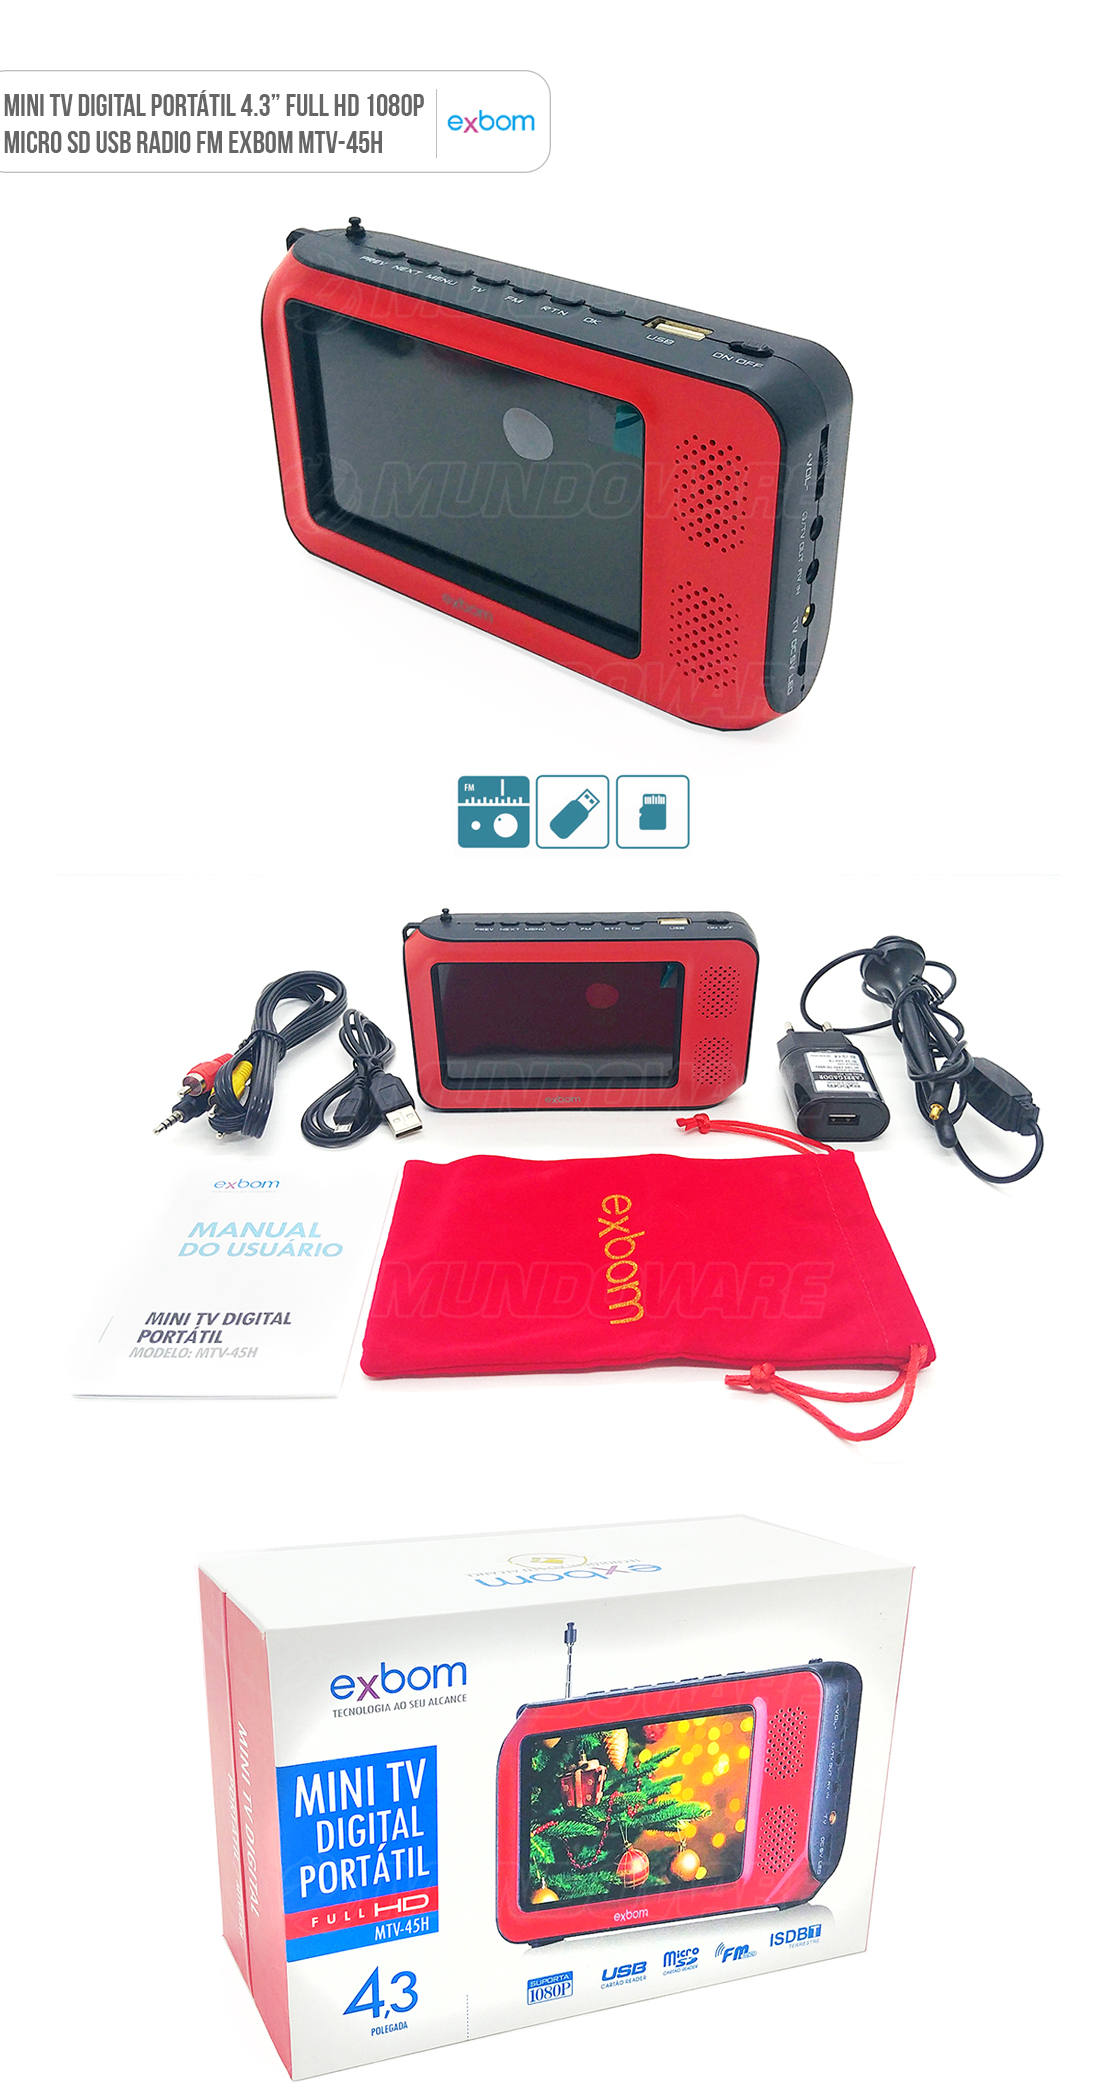 Mini Multimidia TV Digital Portátil 4.3 polegadas Vermelha